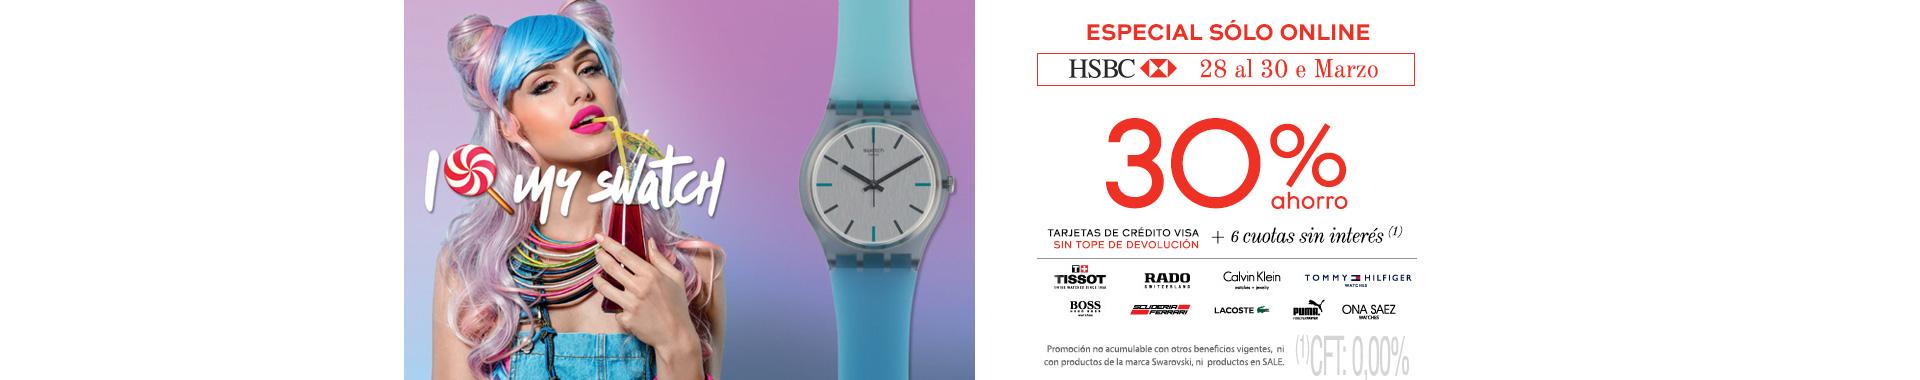 HSBC 28 al 30 marzo